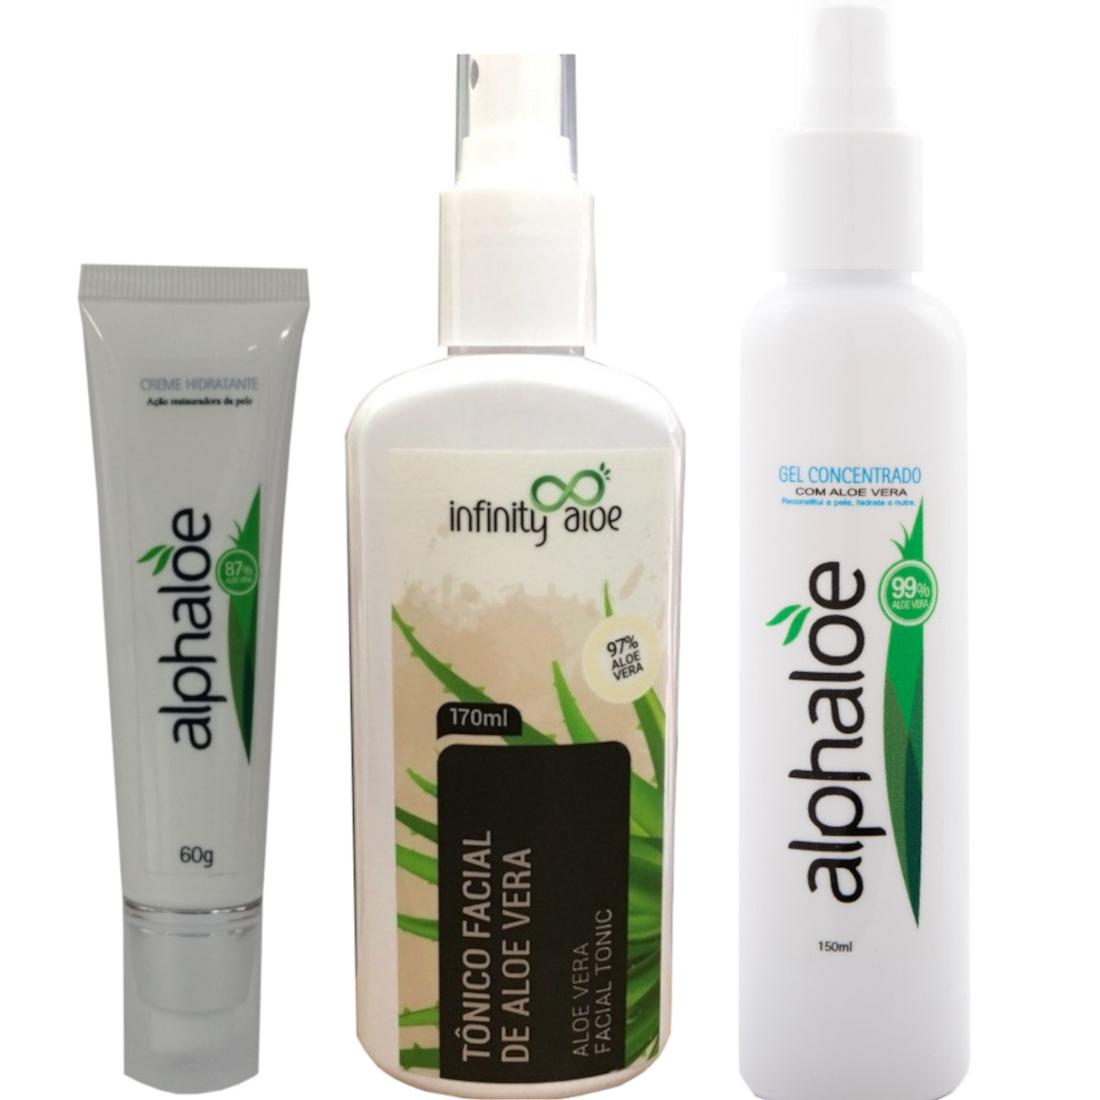 Kit Tônico Facial de Babosa 170ml + Gel Concentrado com Aloe Vera 150ml + Creme Hidratante de Aloe Vera 87% de Babosa 60